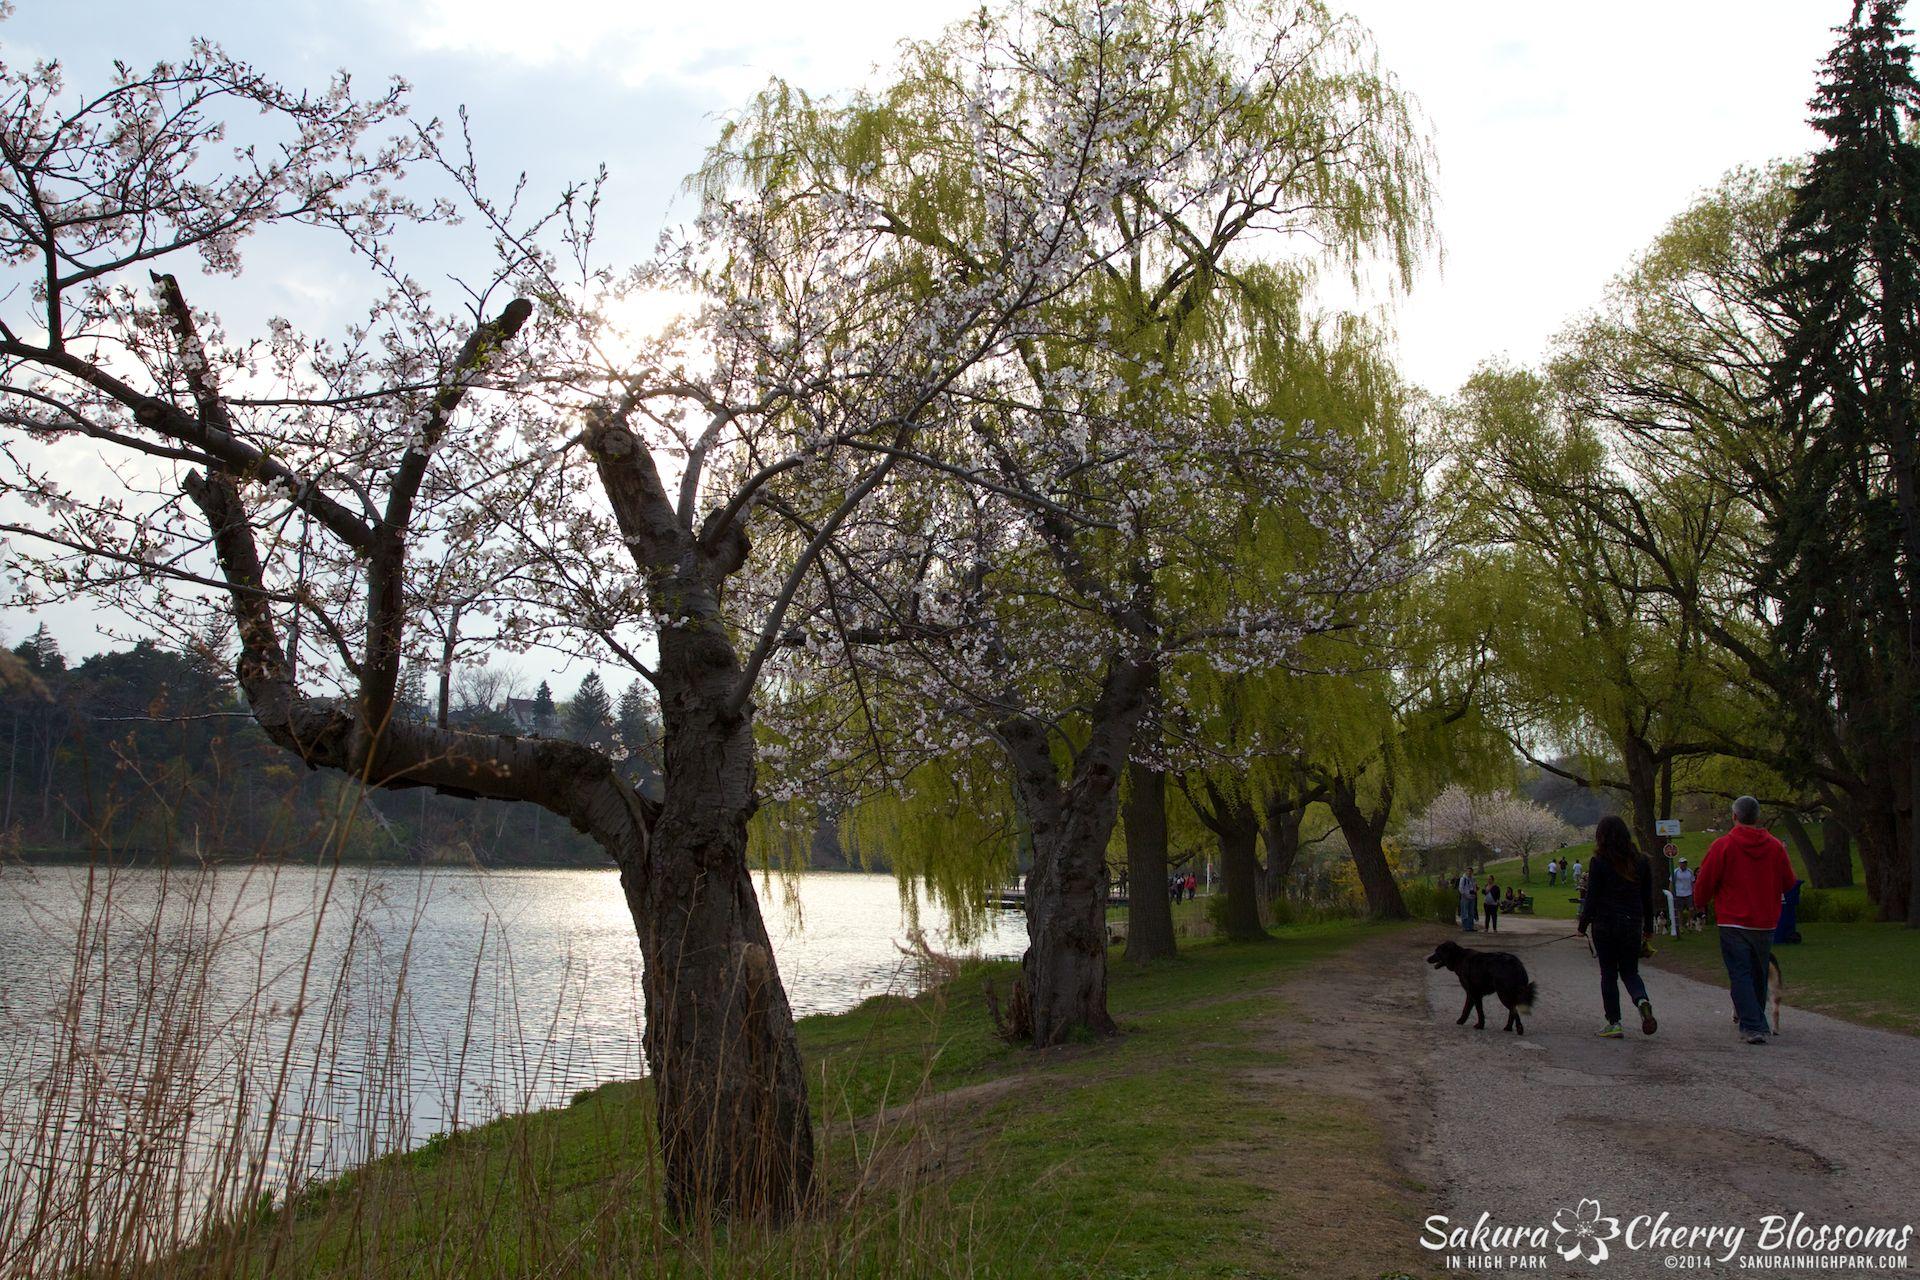 SakuraInHighPark-May1314-423.jpg